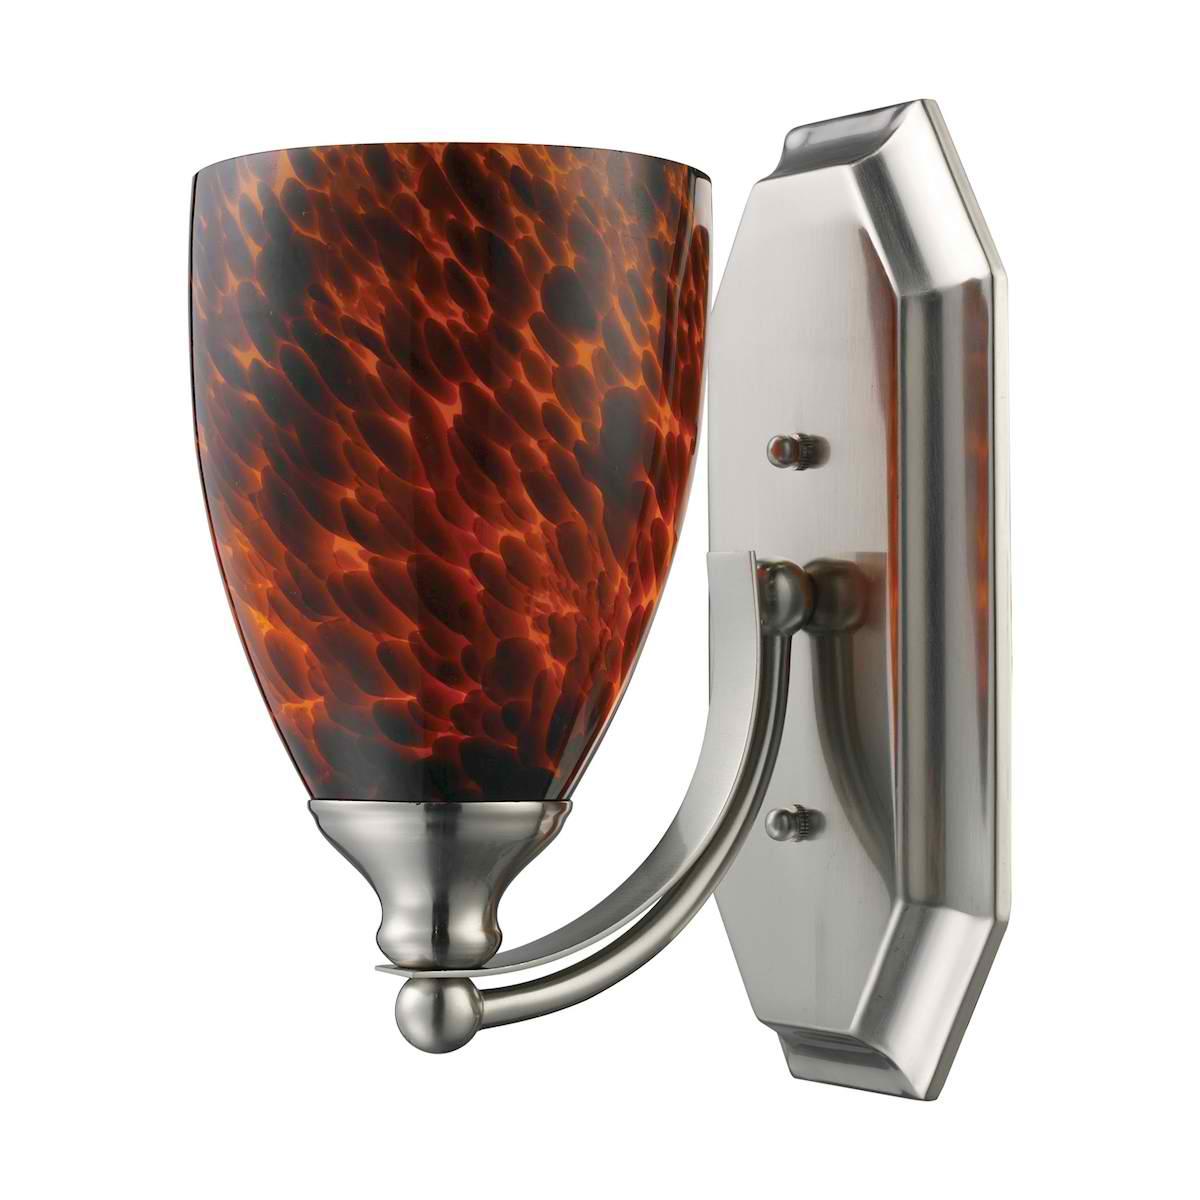 Vanity 1 Light Satin Nickel with Espresso Glass